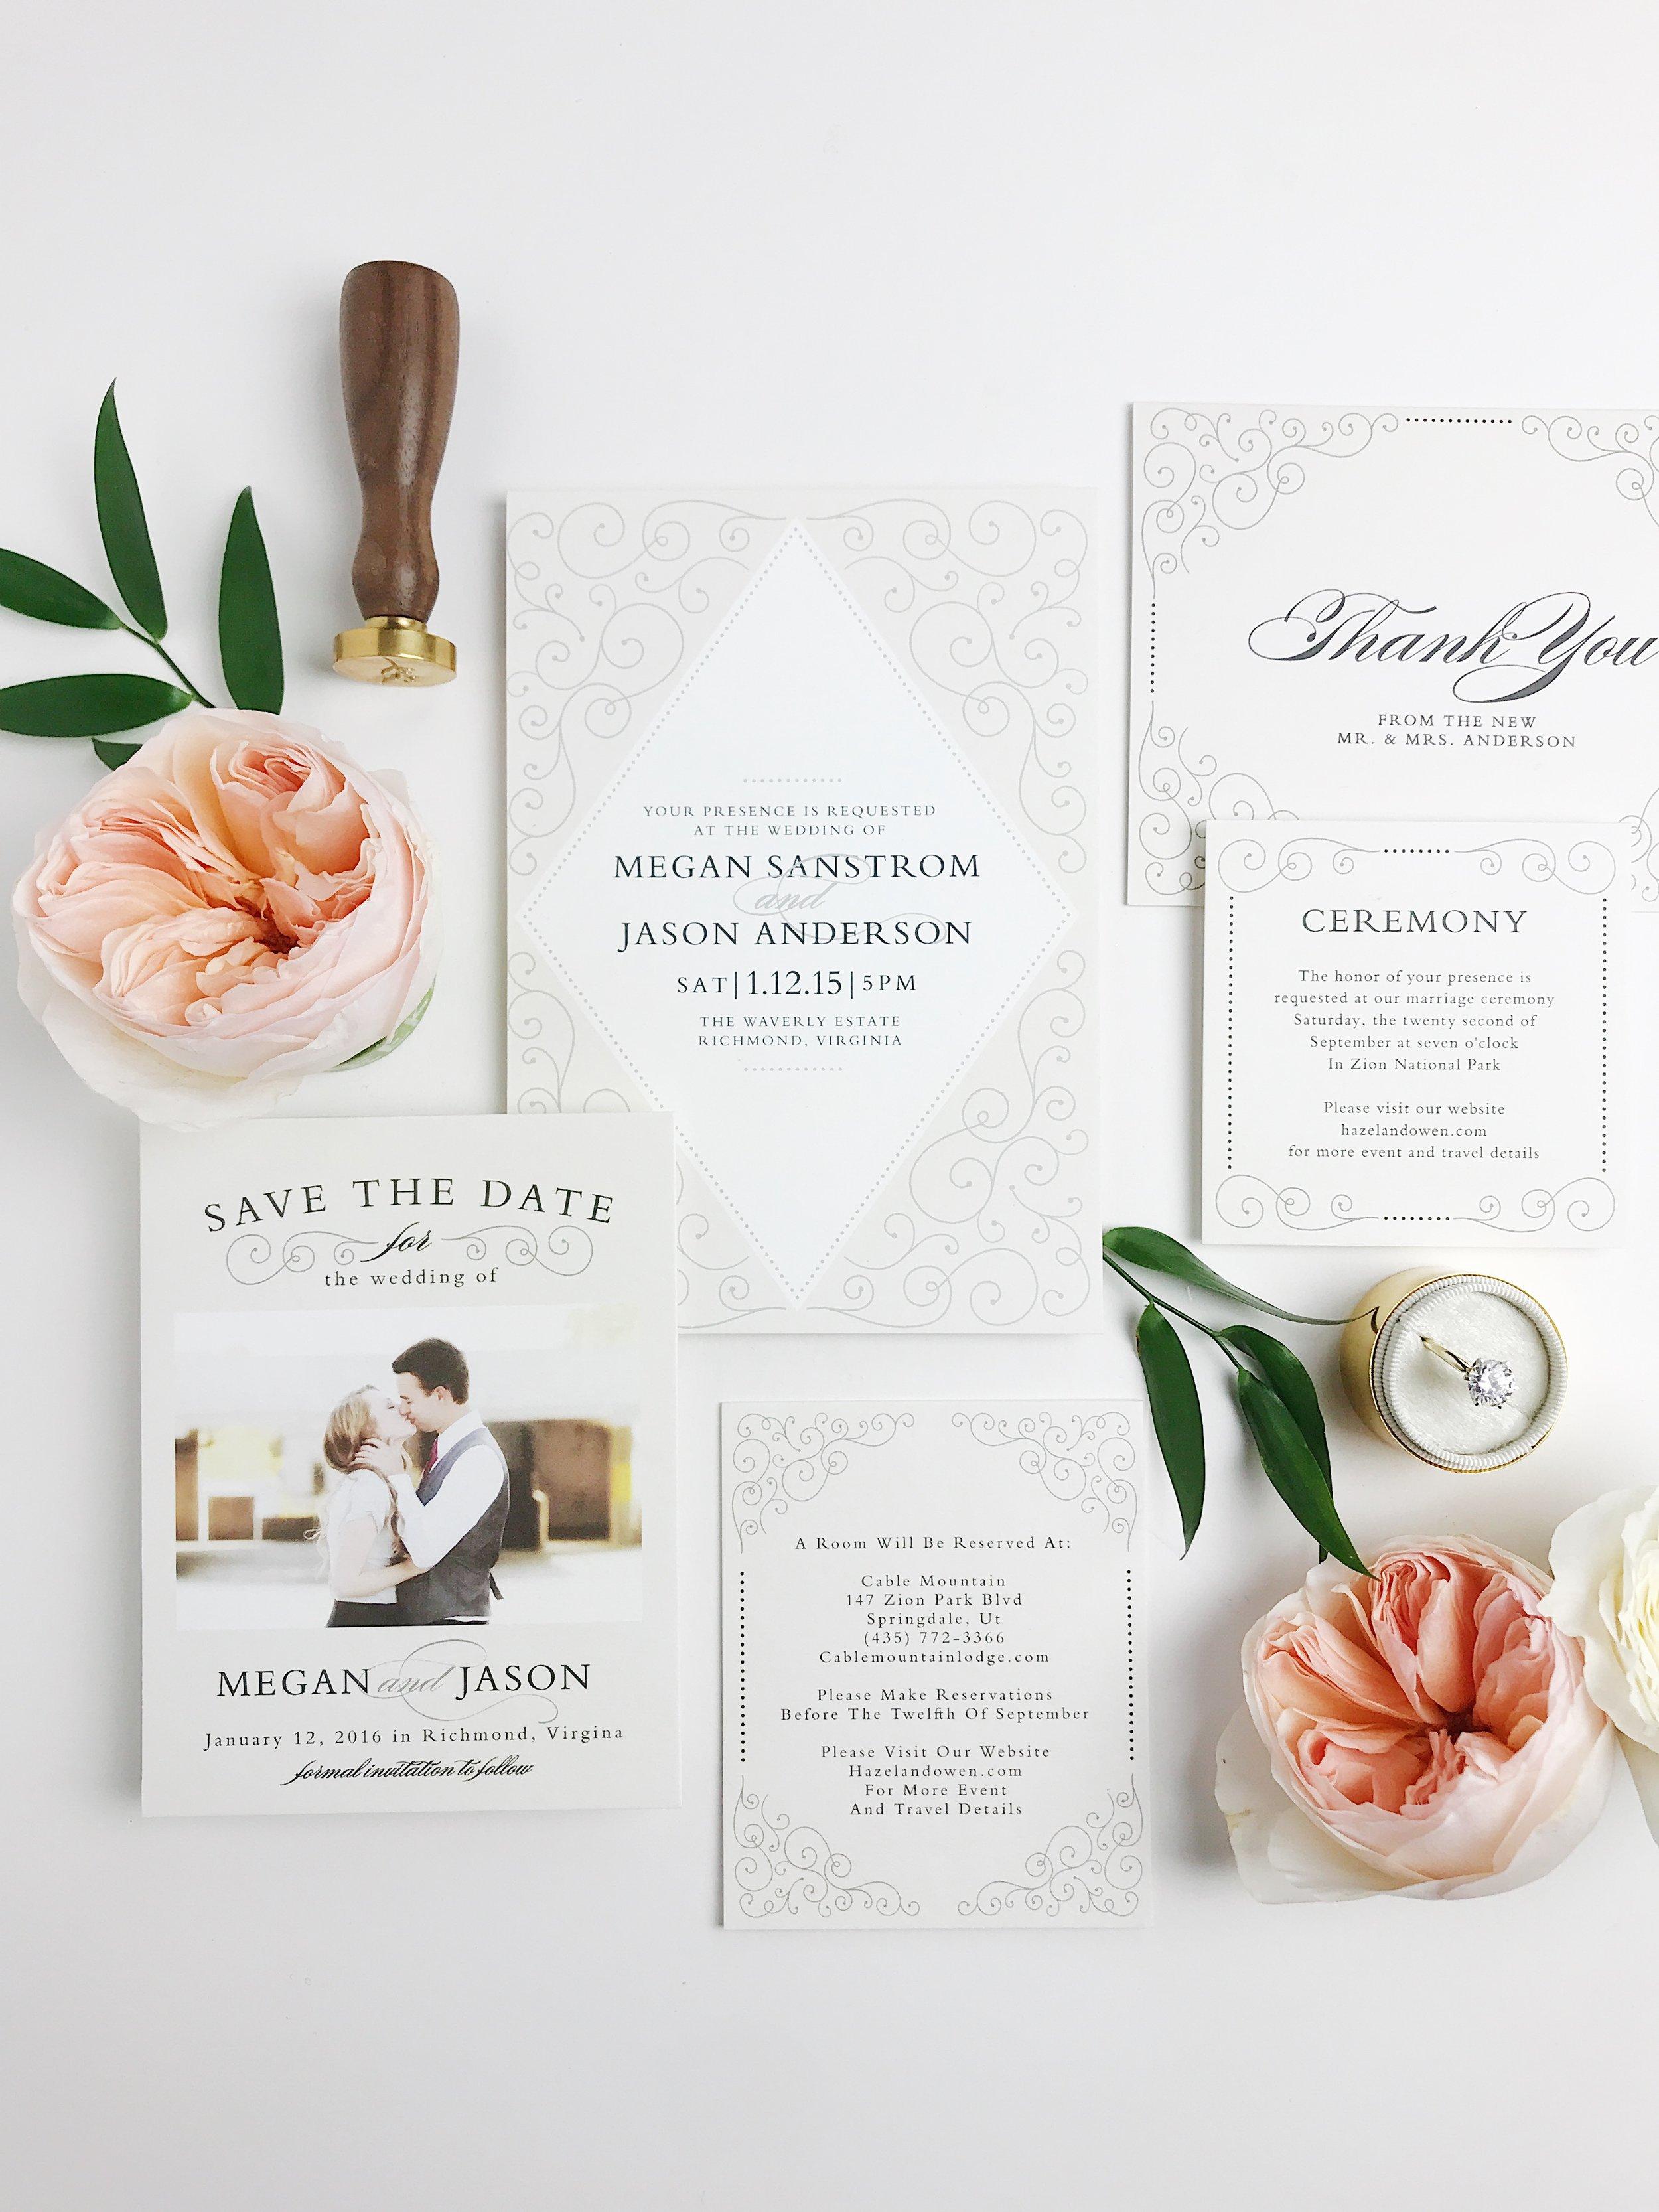 Basic_Invite_Wedding_Suites_36.jpg